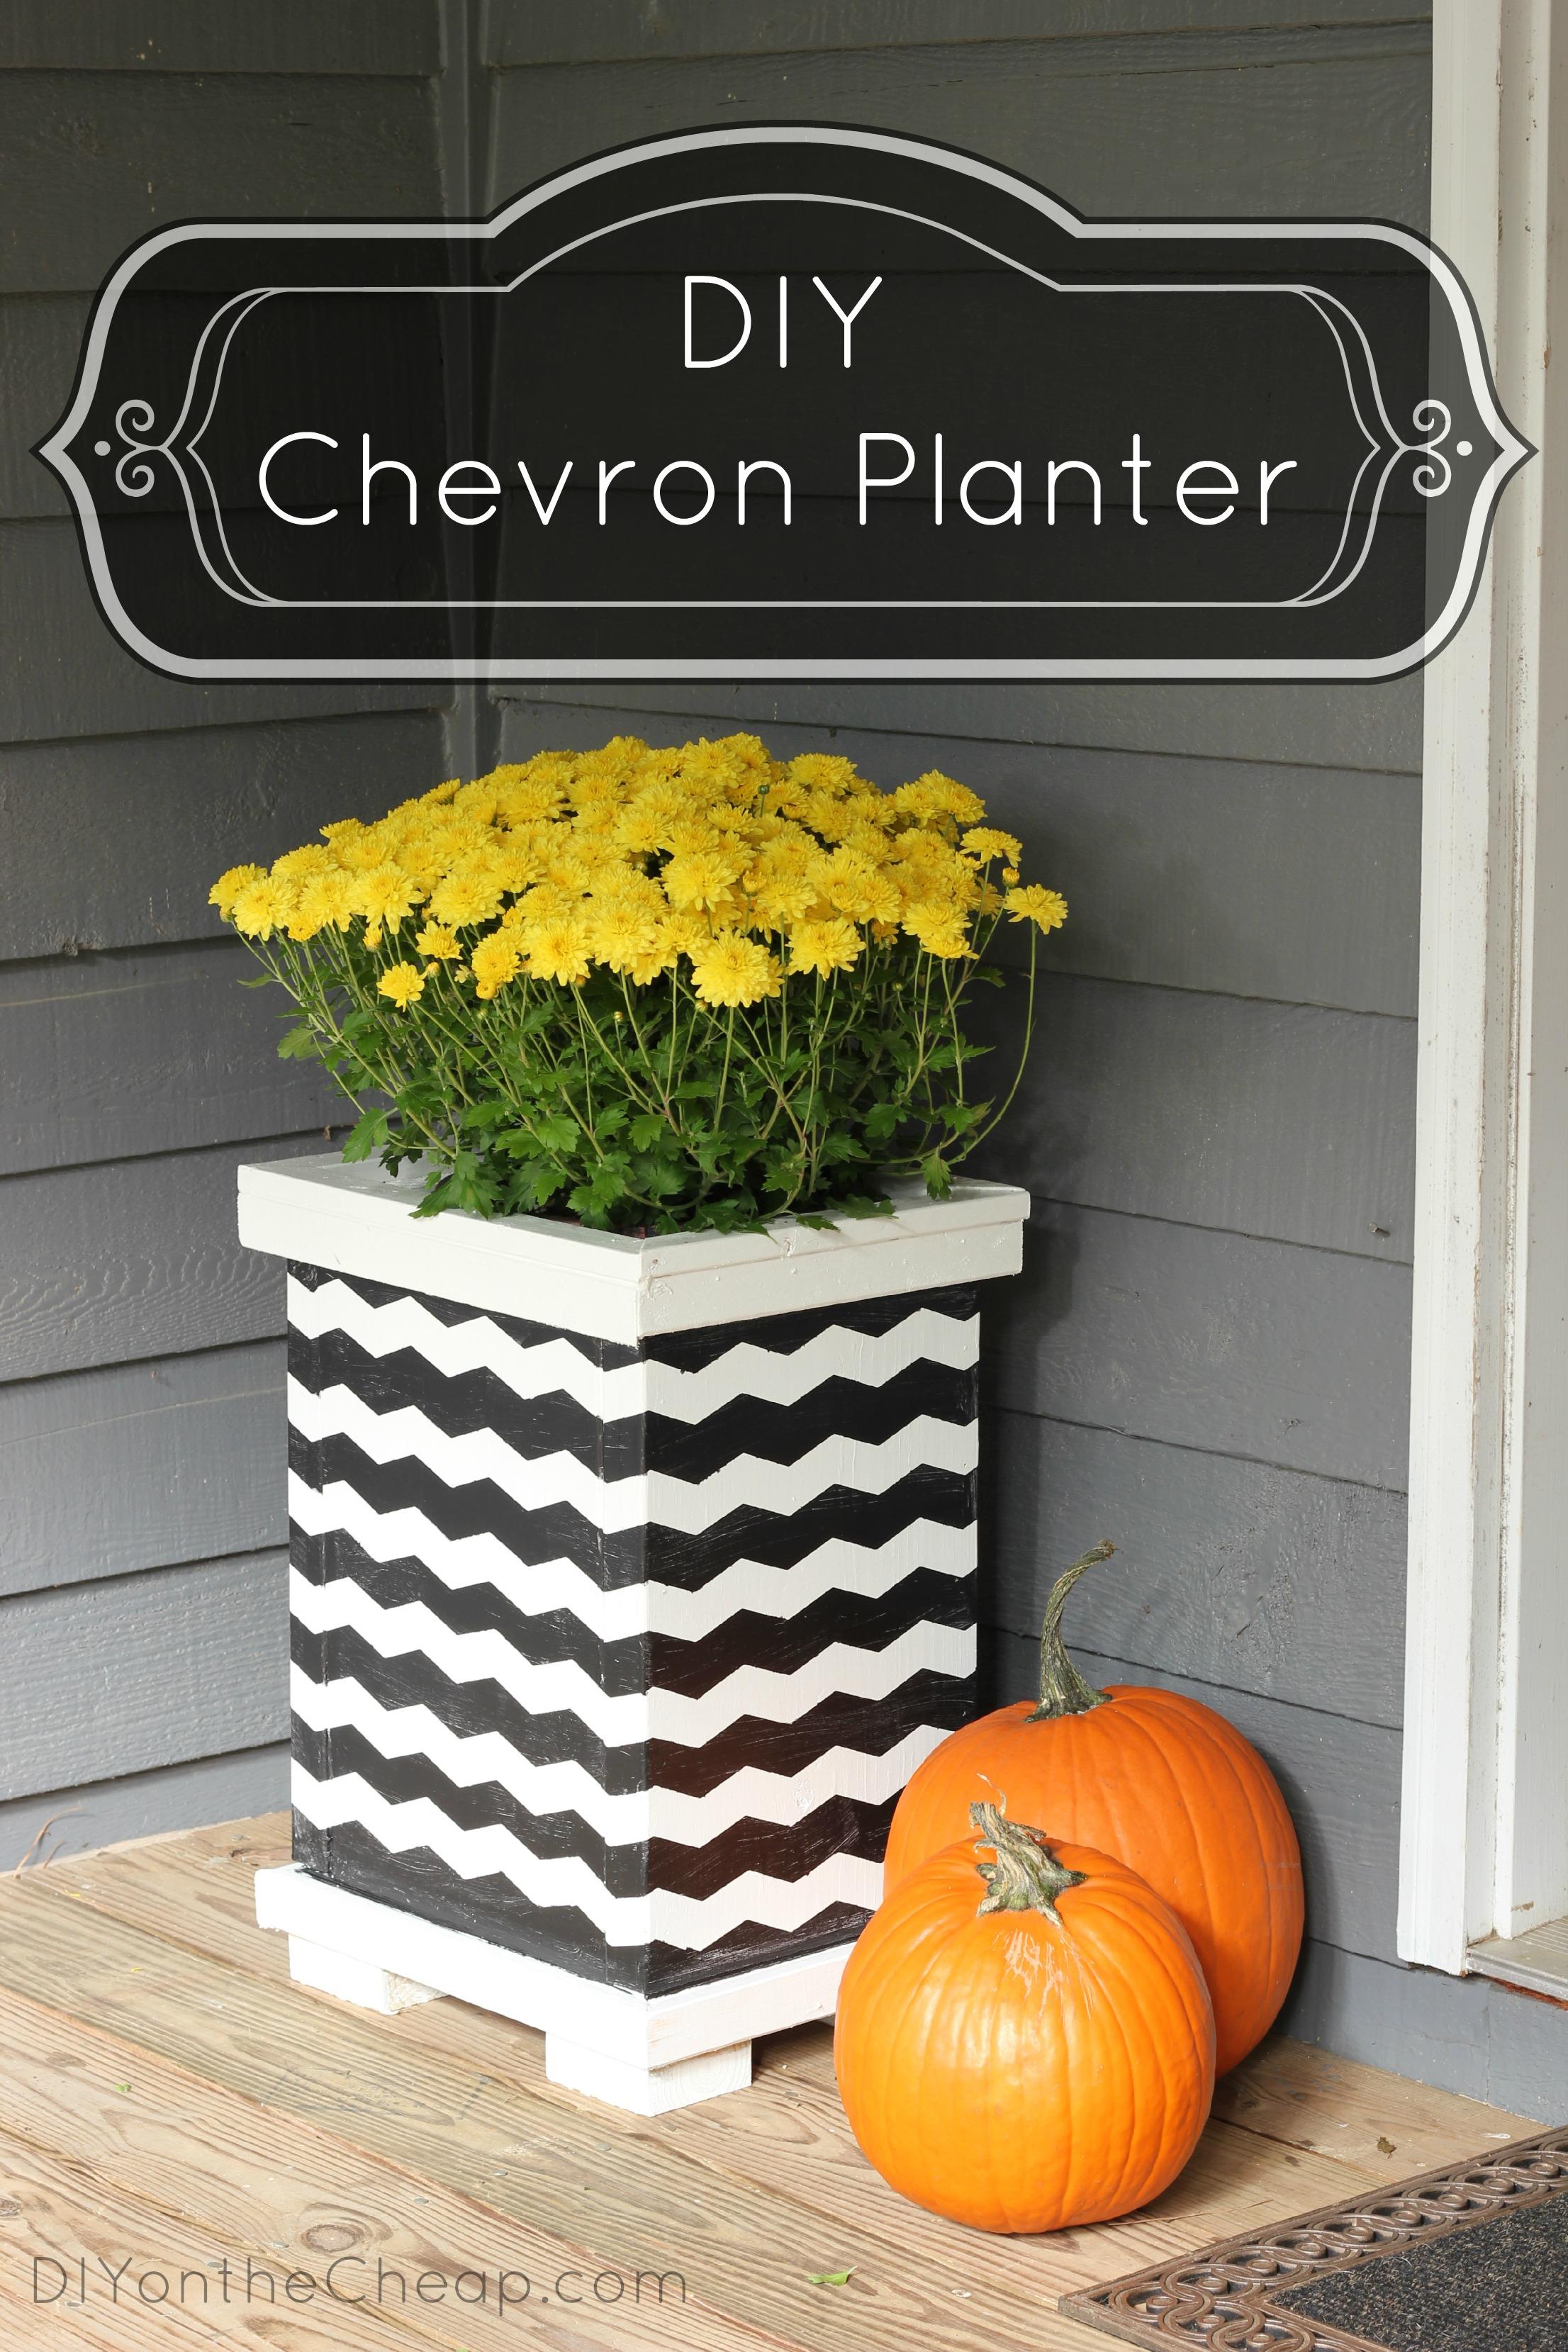 Diy chevron planter